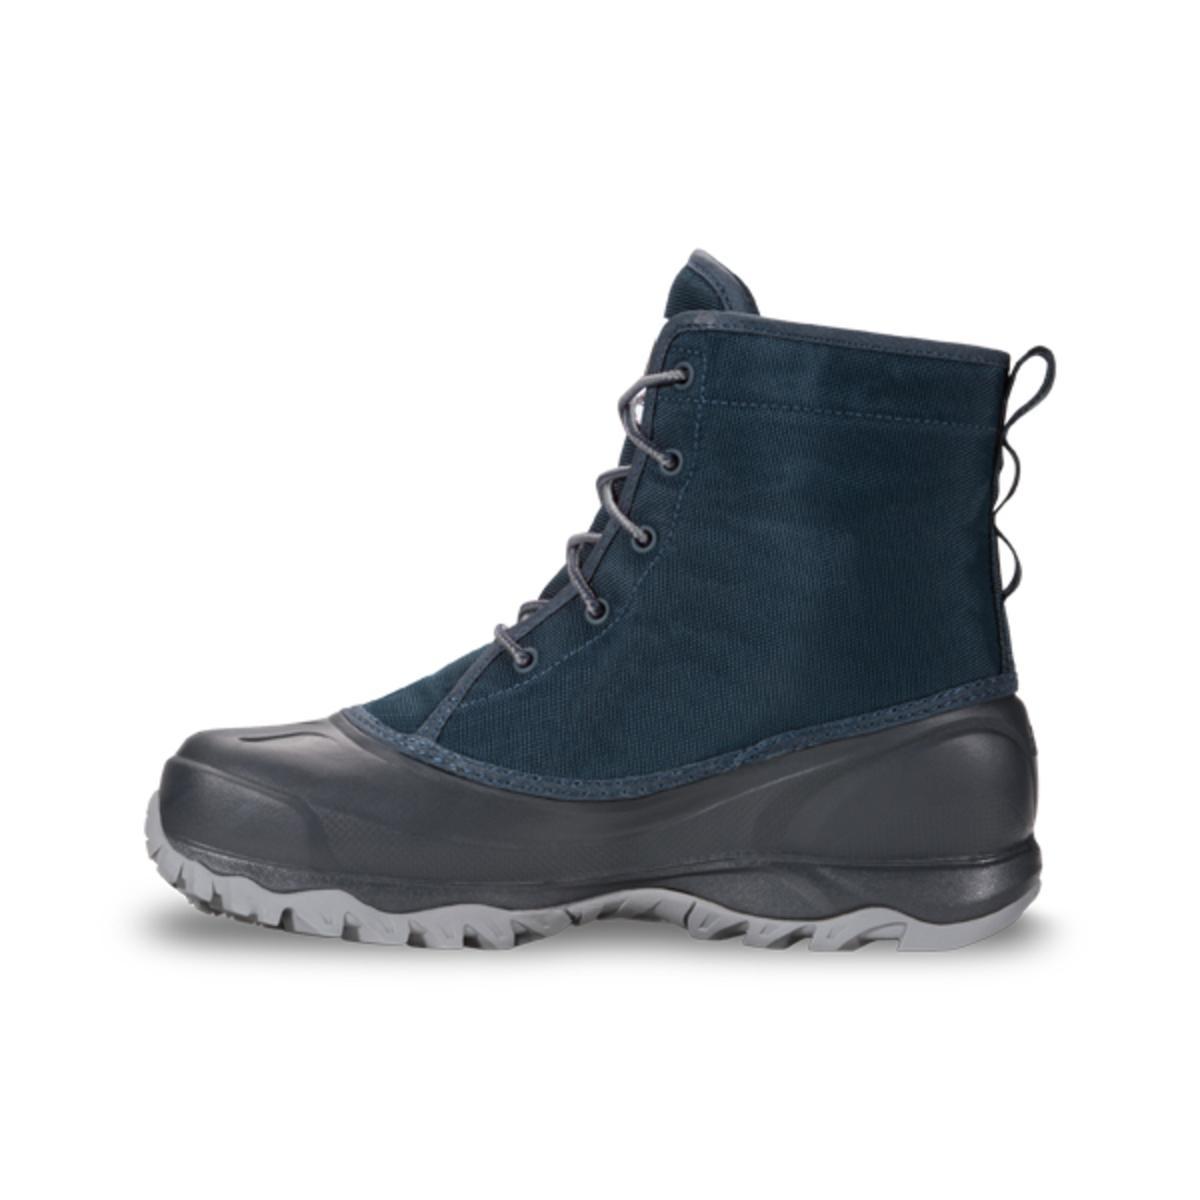 The North Face Women's Tsumoru Boot